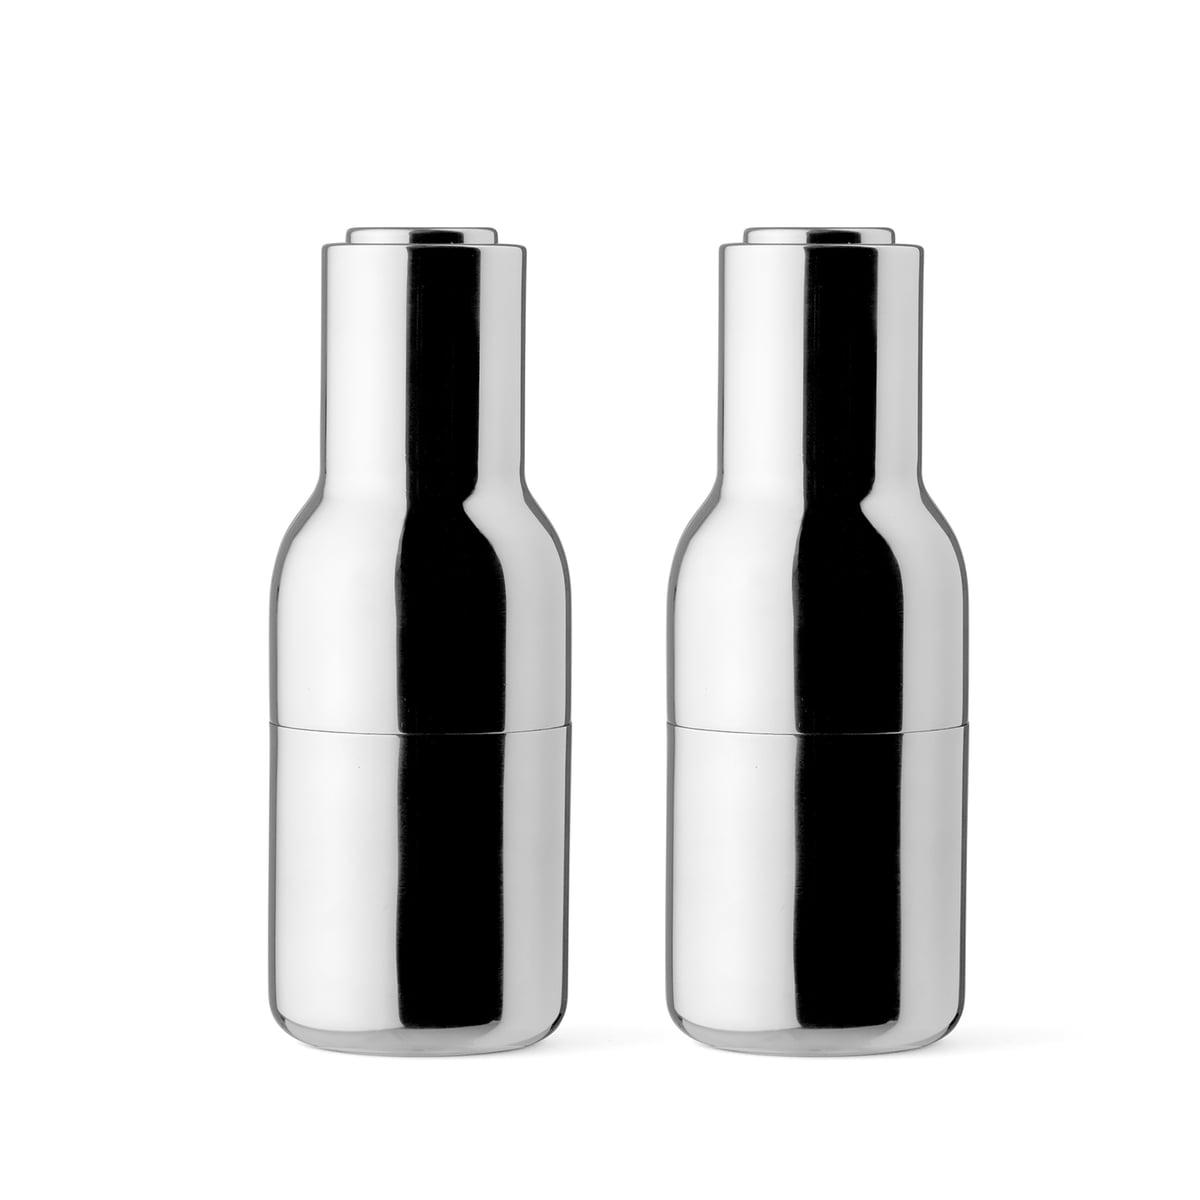 menu bottle salz und pfefferm hle edelstahl poliert. Black Bedroom Furniture Sets. Home Design Ideas